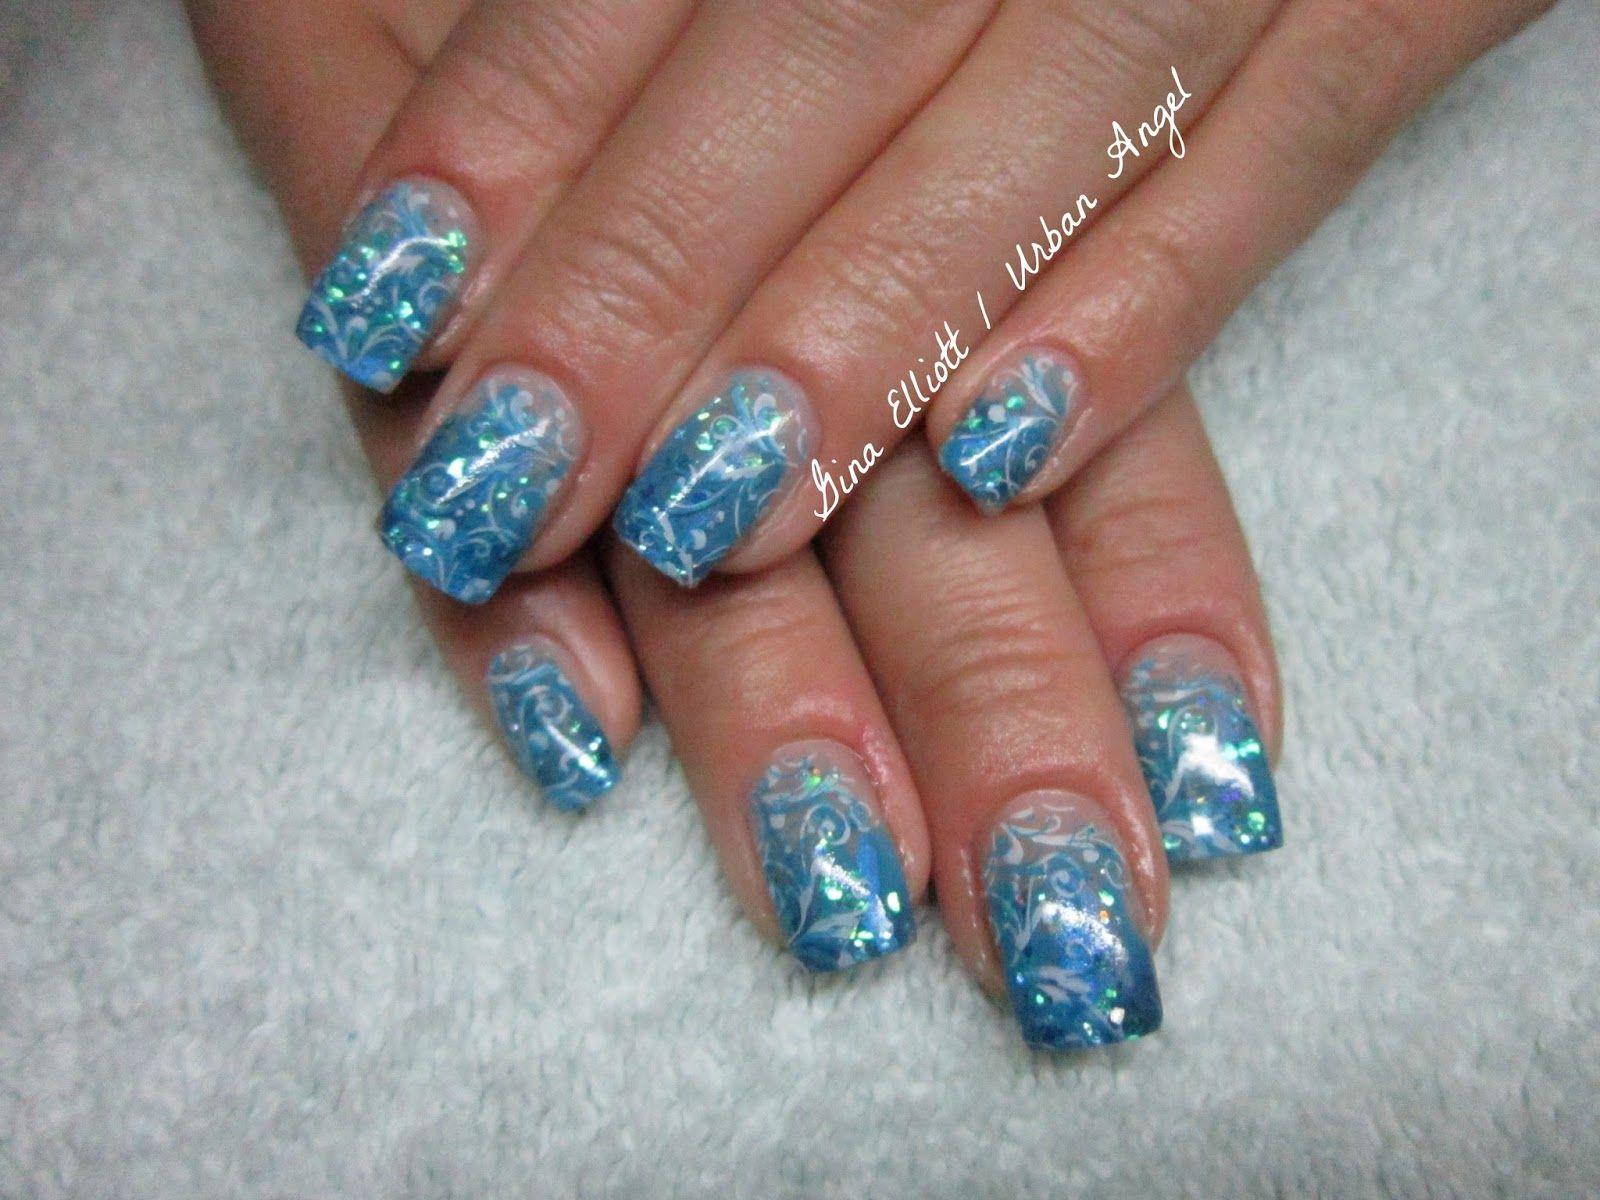 Blue Lagoon - Thermo gel & mica nail design | Urban Angel Nail ...